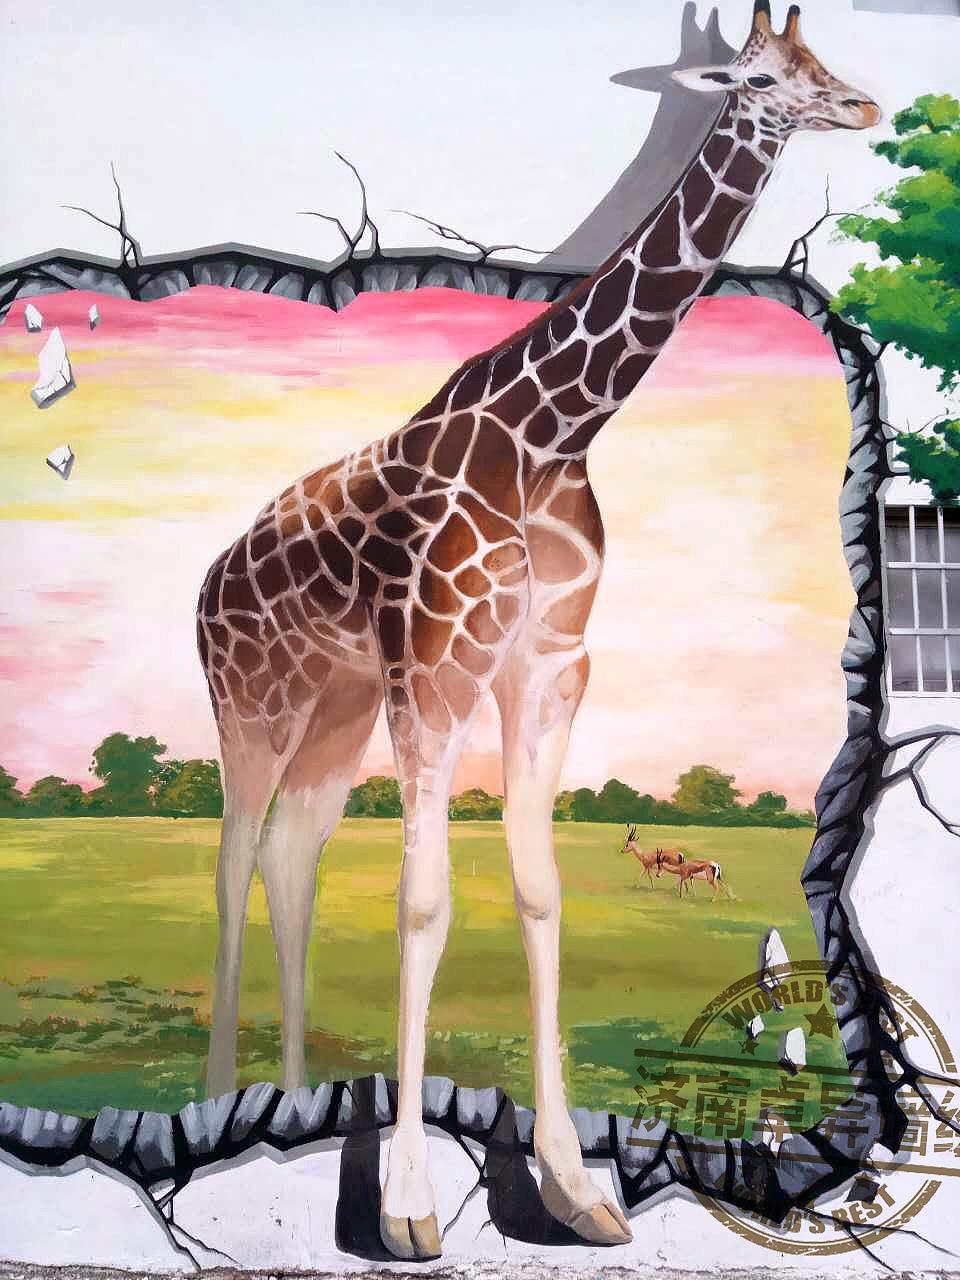 3d墙画_美丽乡村3D画 农村3D墙绘 其他 墙绘/立体画 卓异墙绘 - 原创作品 ...